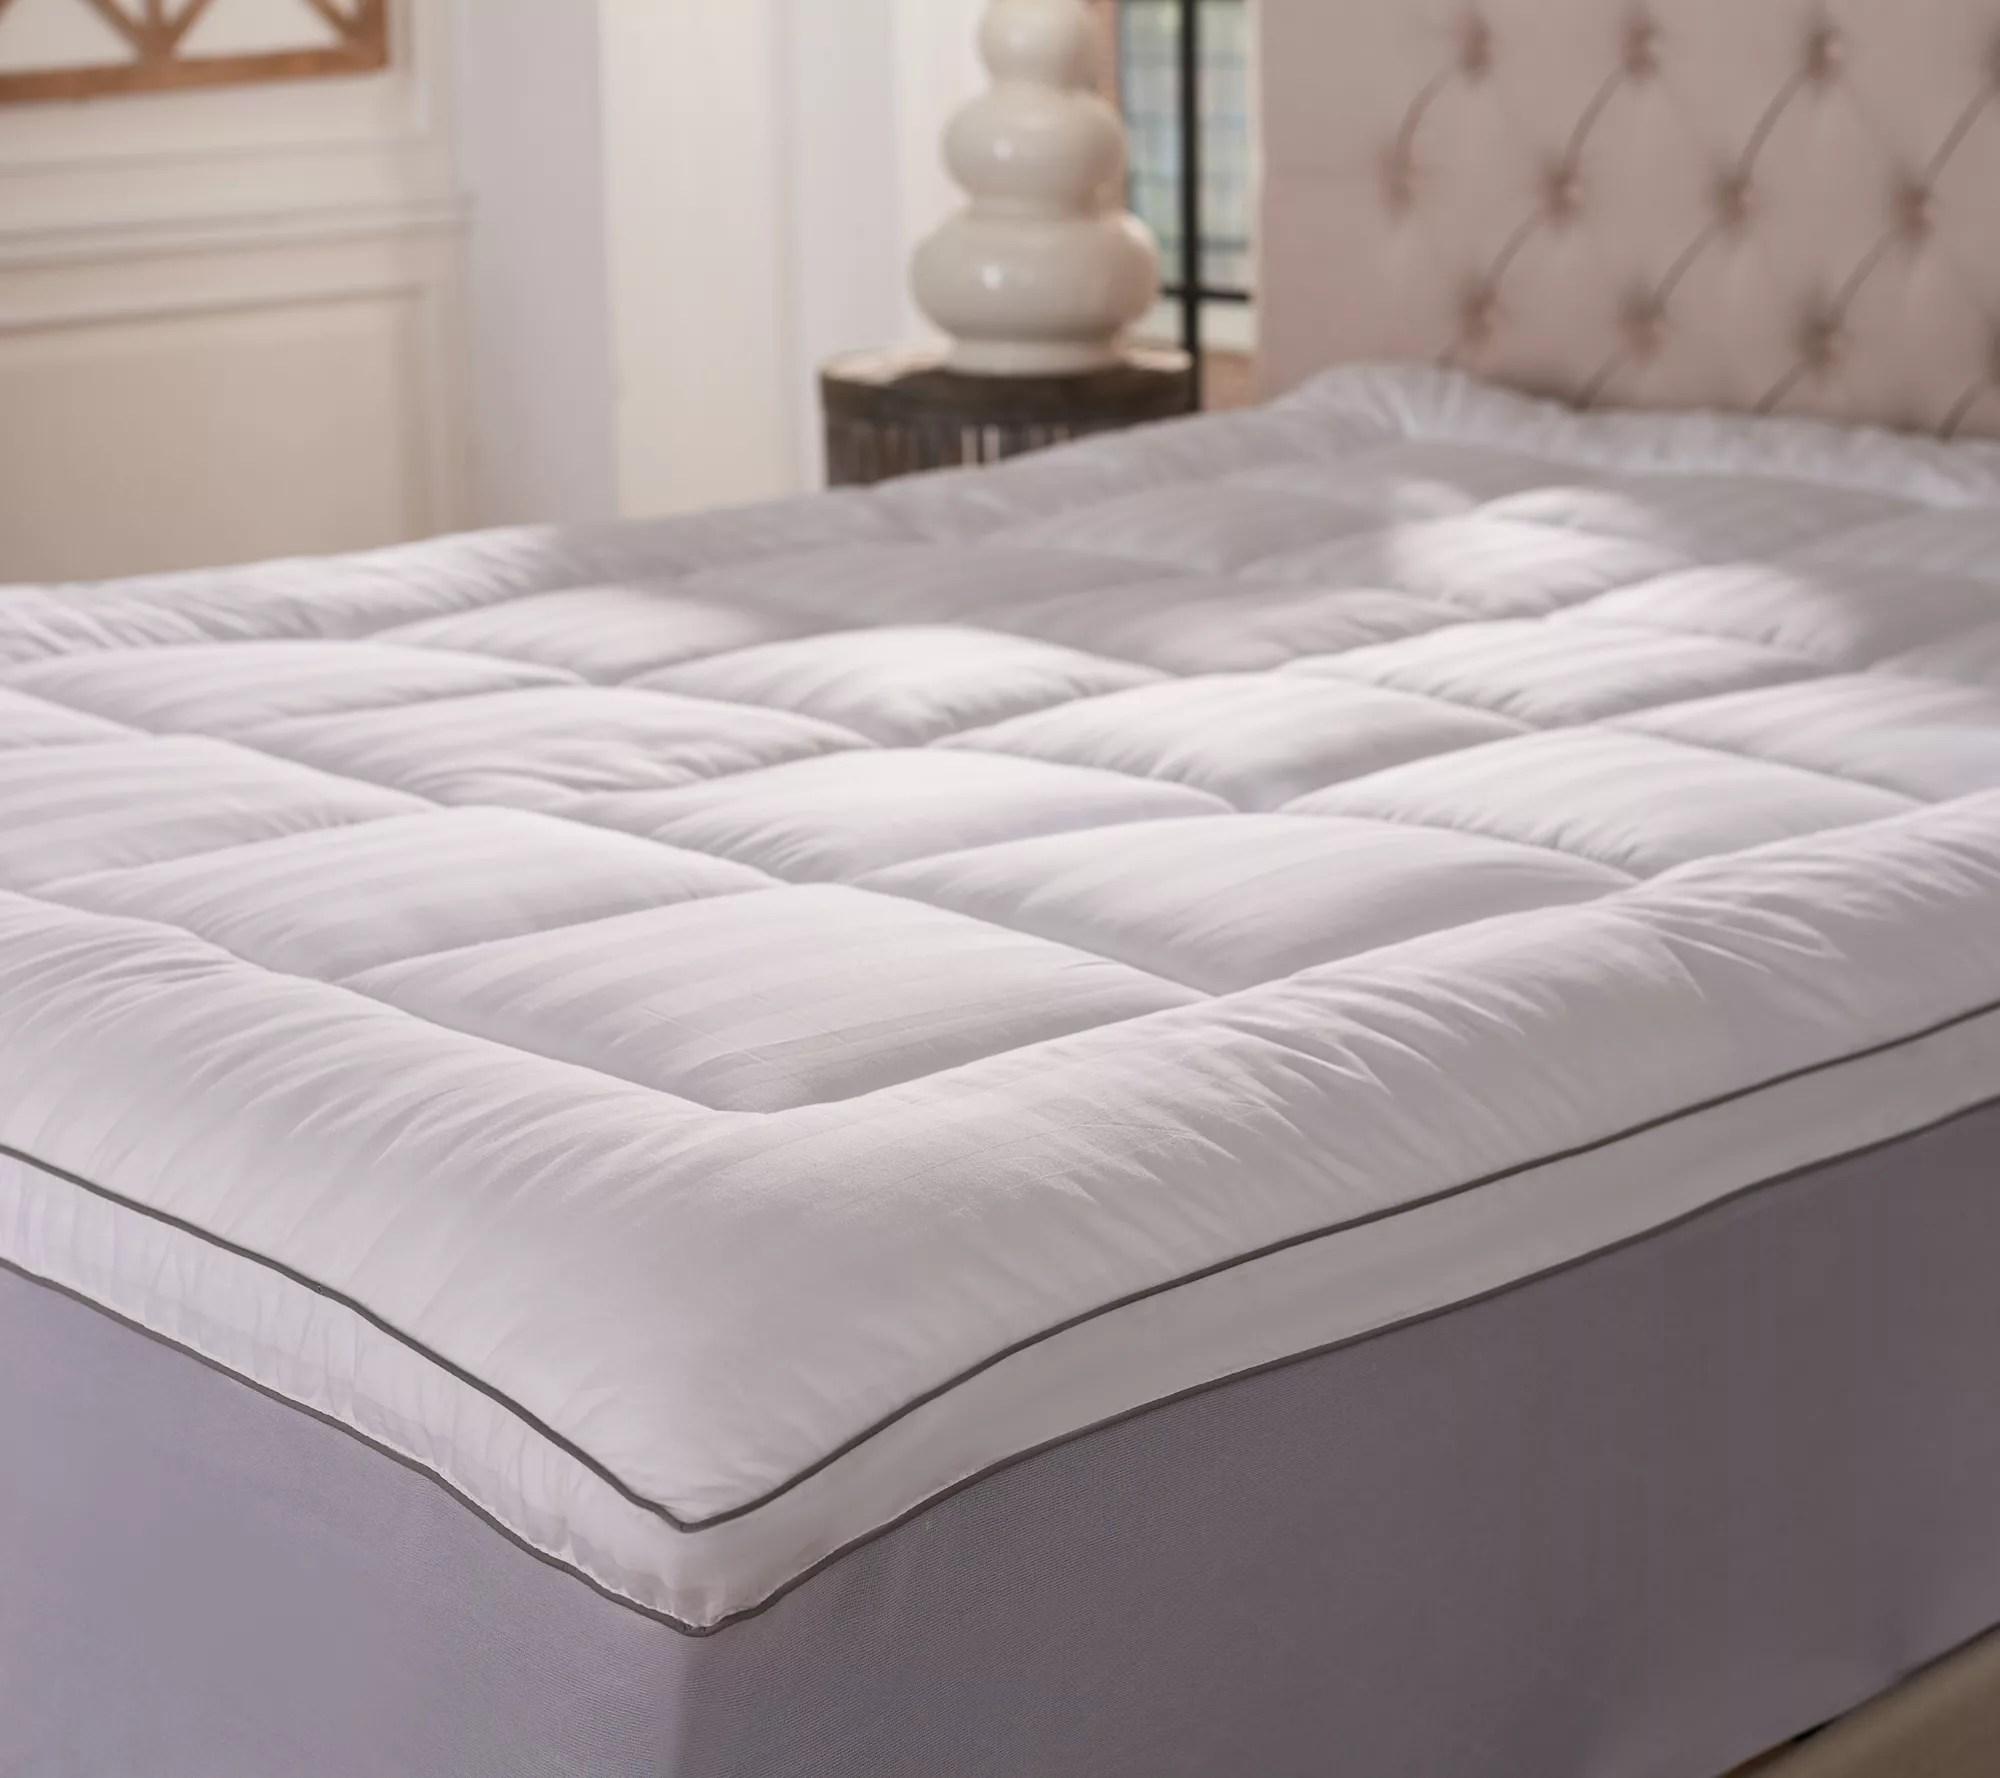 northern nights mattress pads